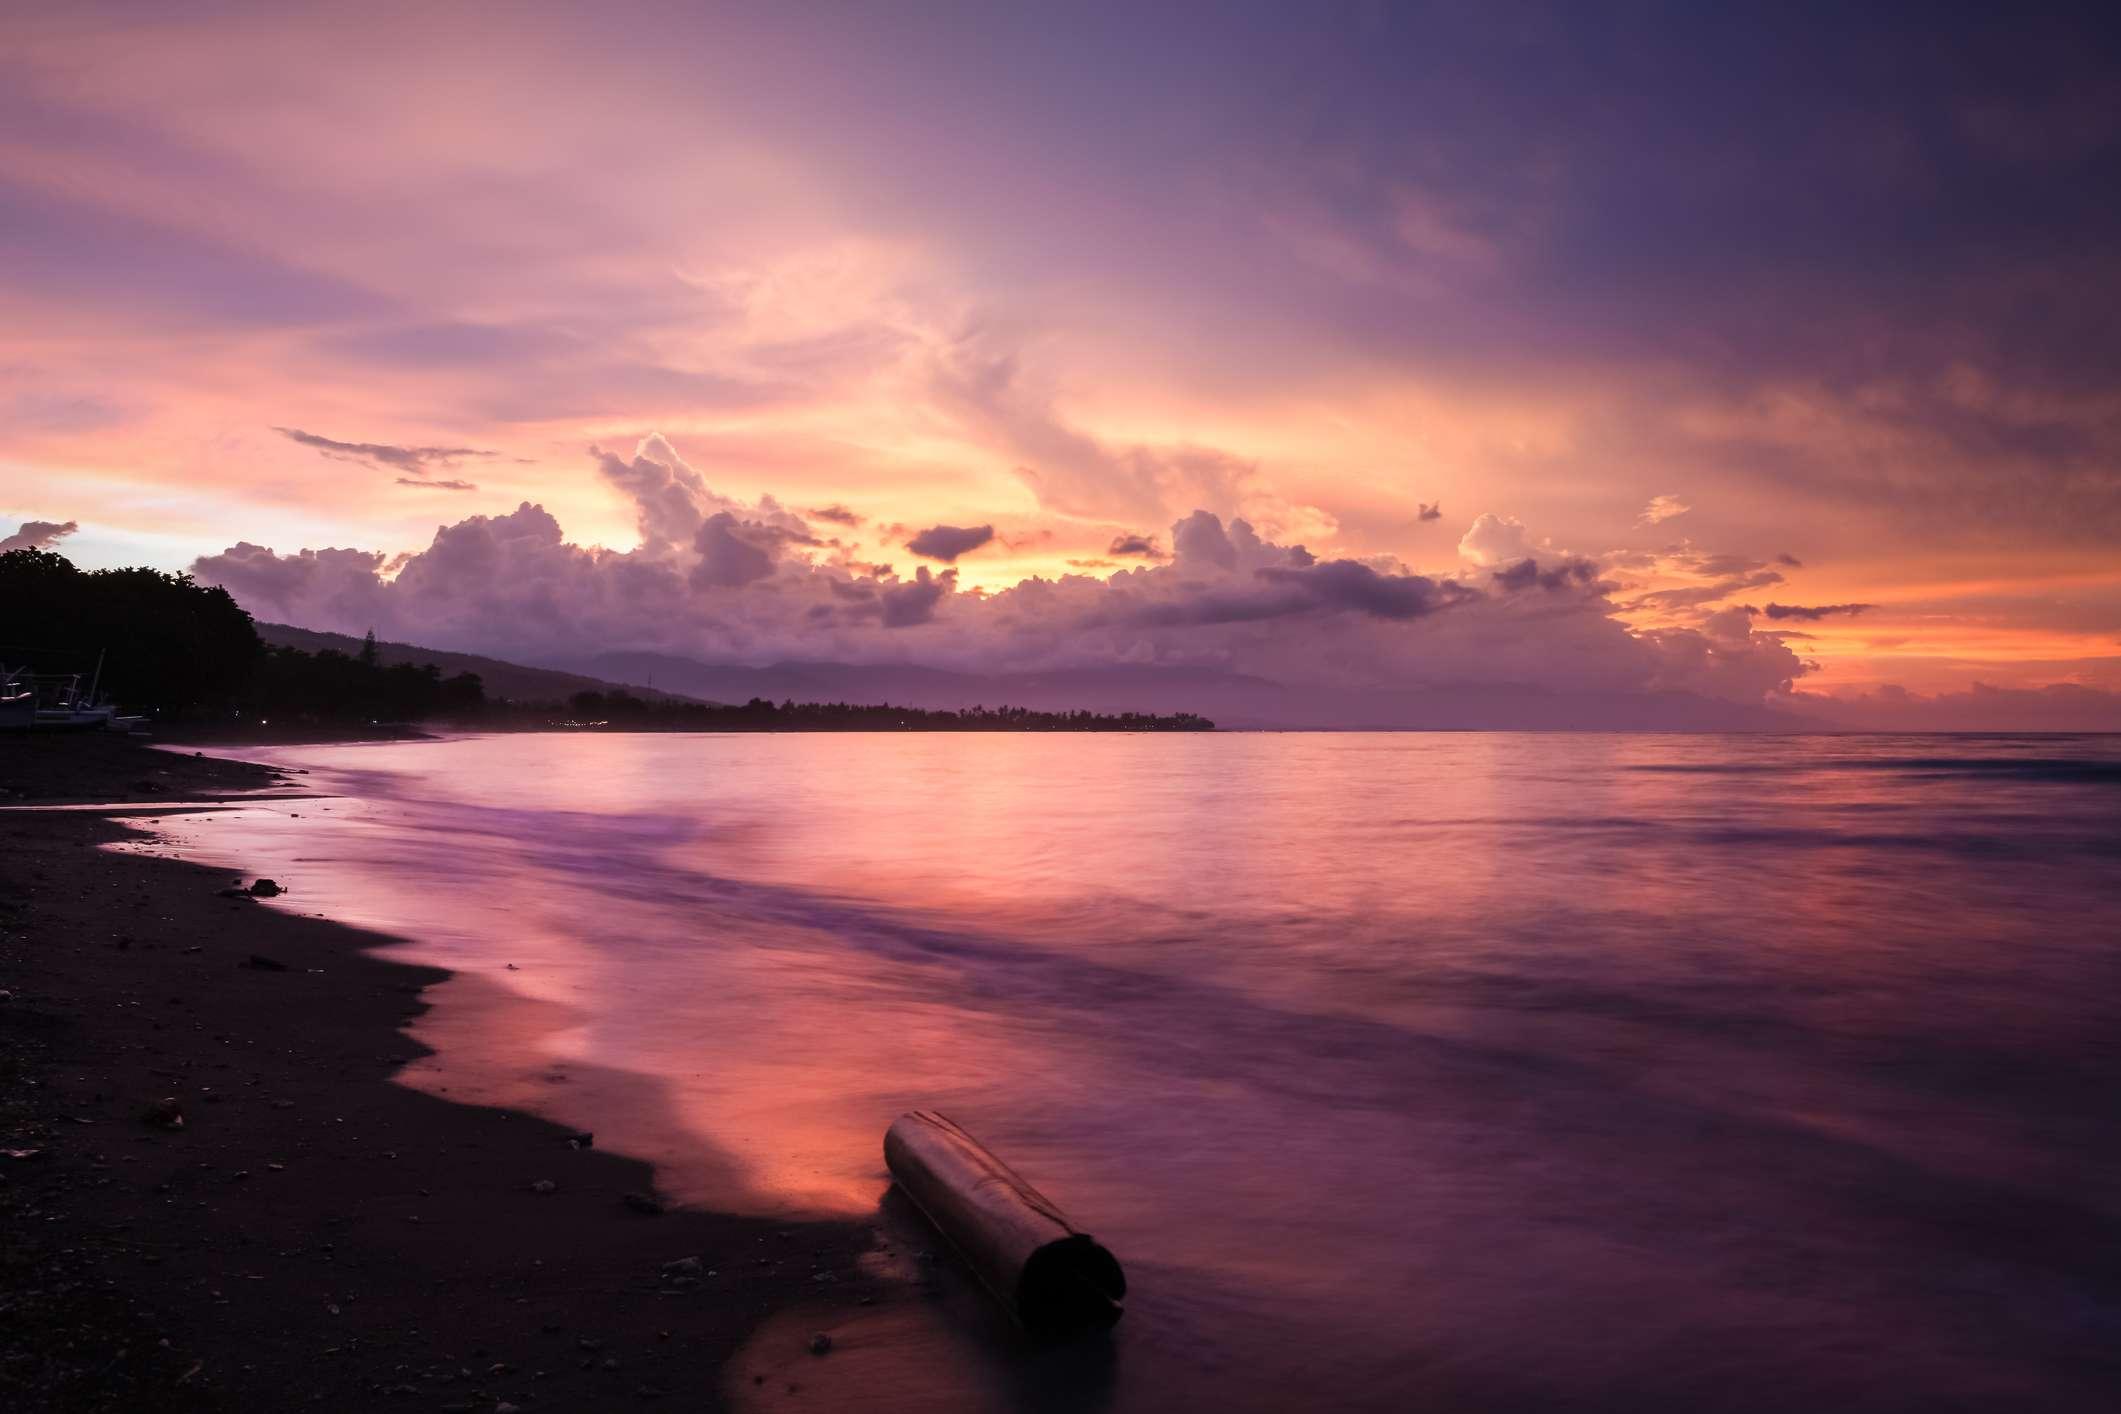 Arena negra en la playa Lovina en Bali